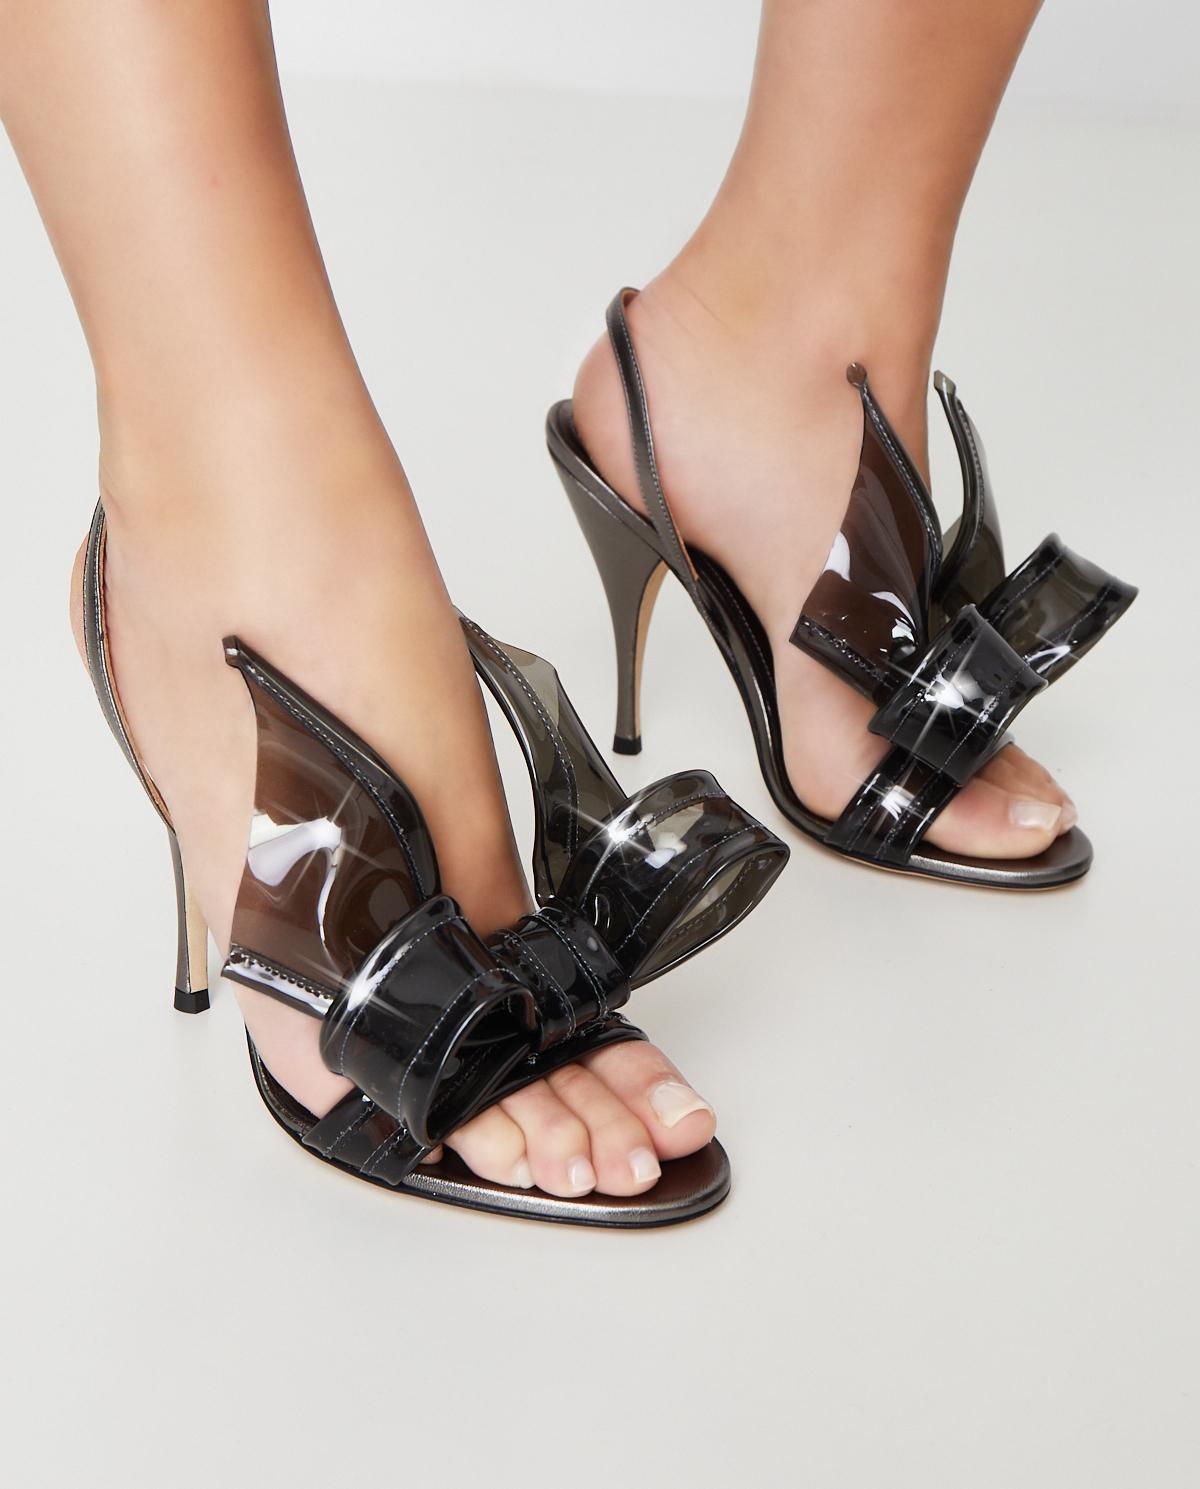 Szare sandały z kokardą Marco de Vincenzo MXV310 091